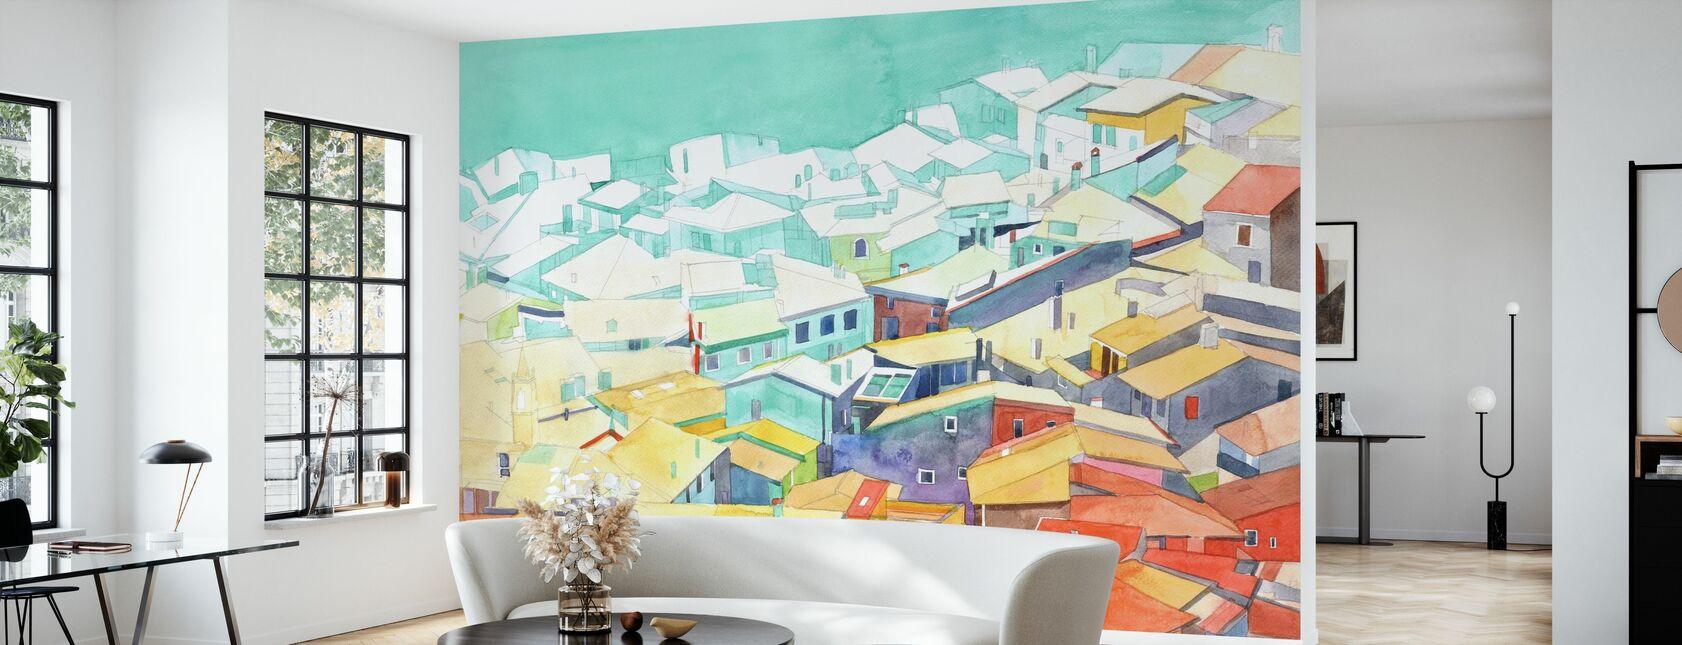 Summer in Malcesine - Wallpaper - Living Room